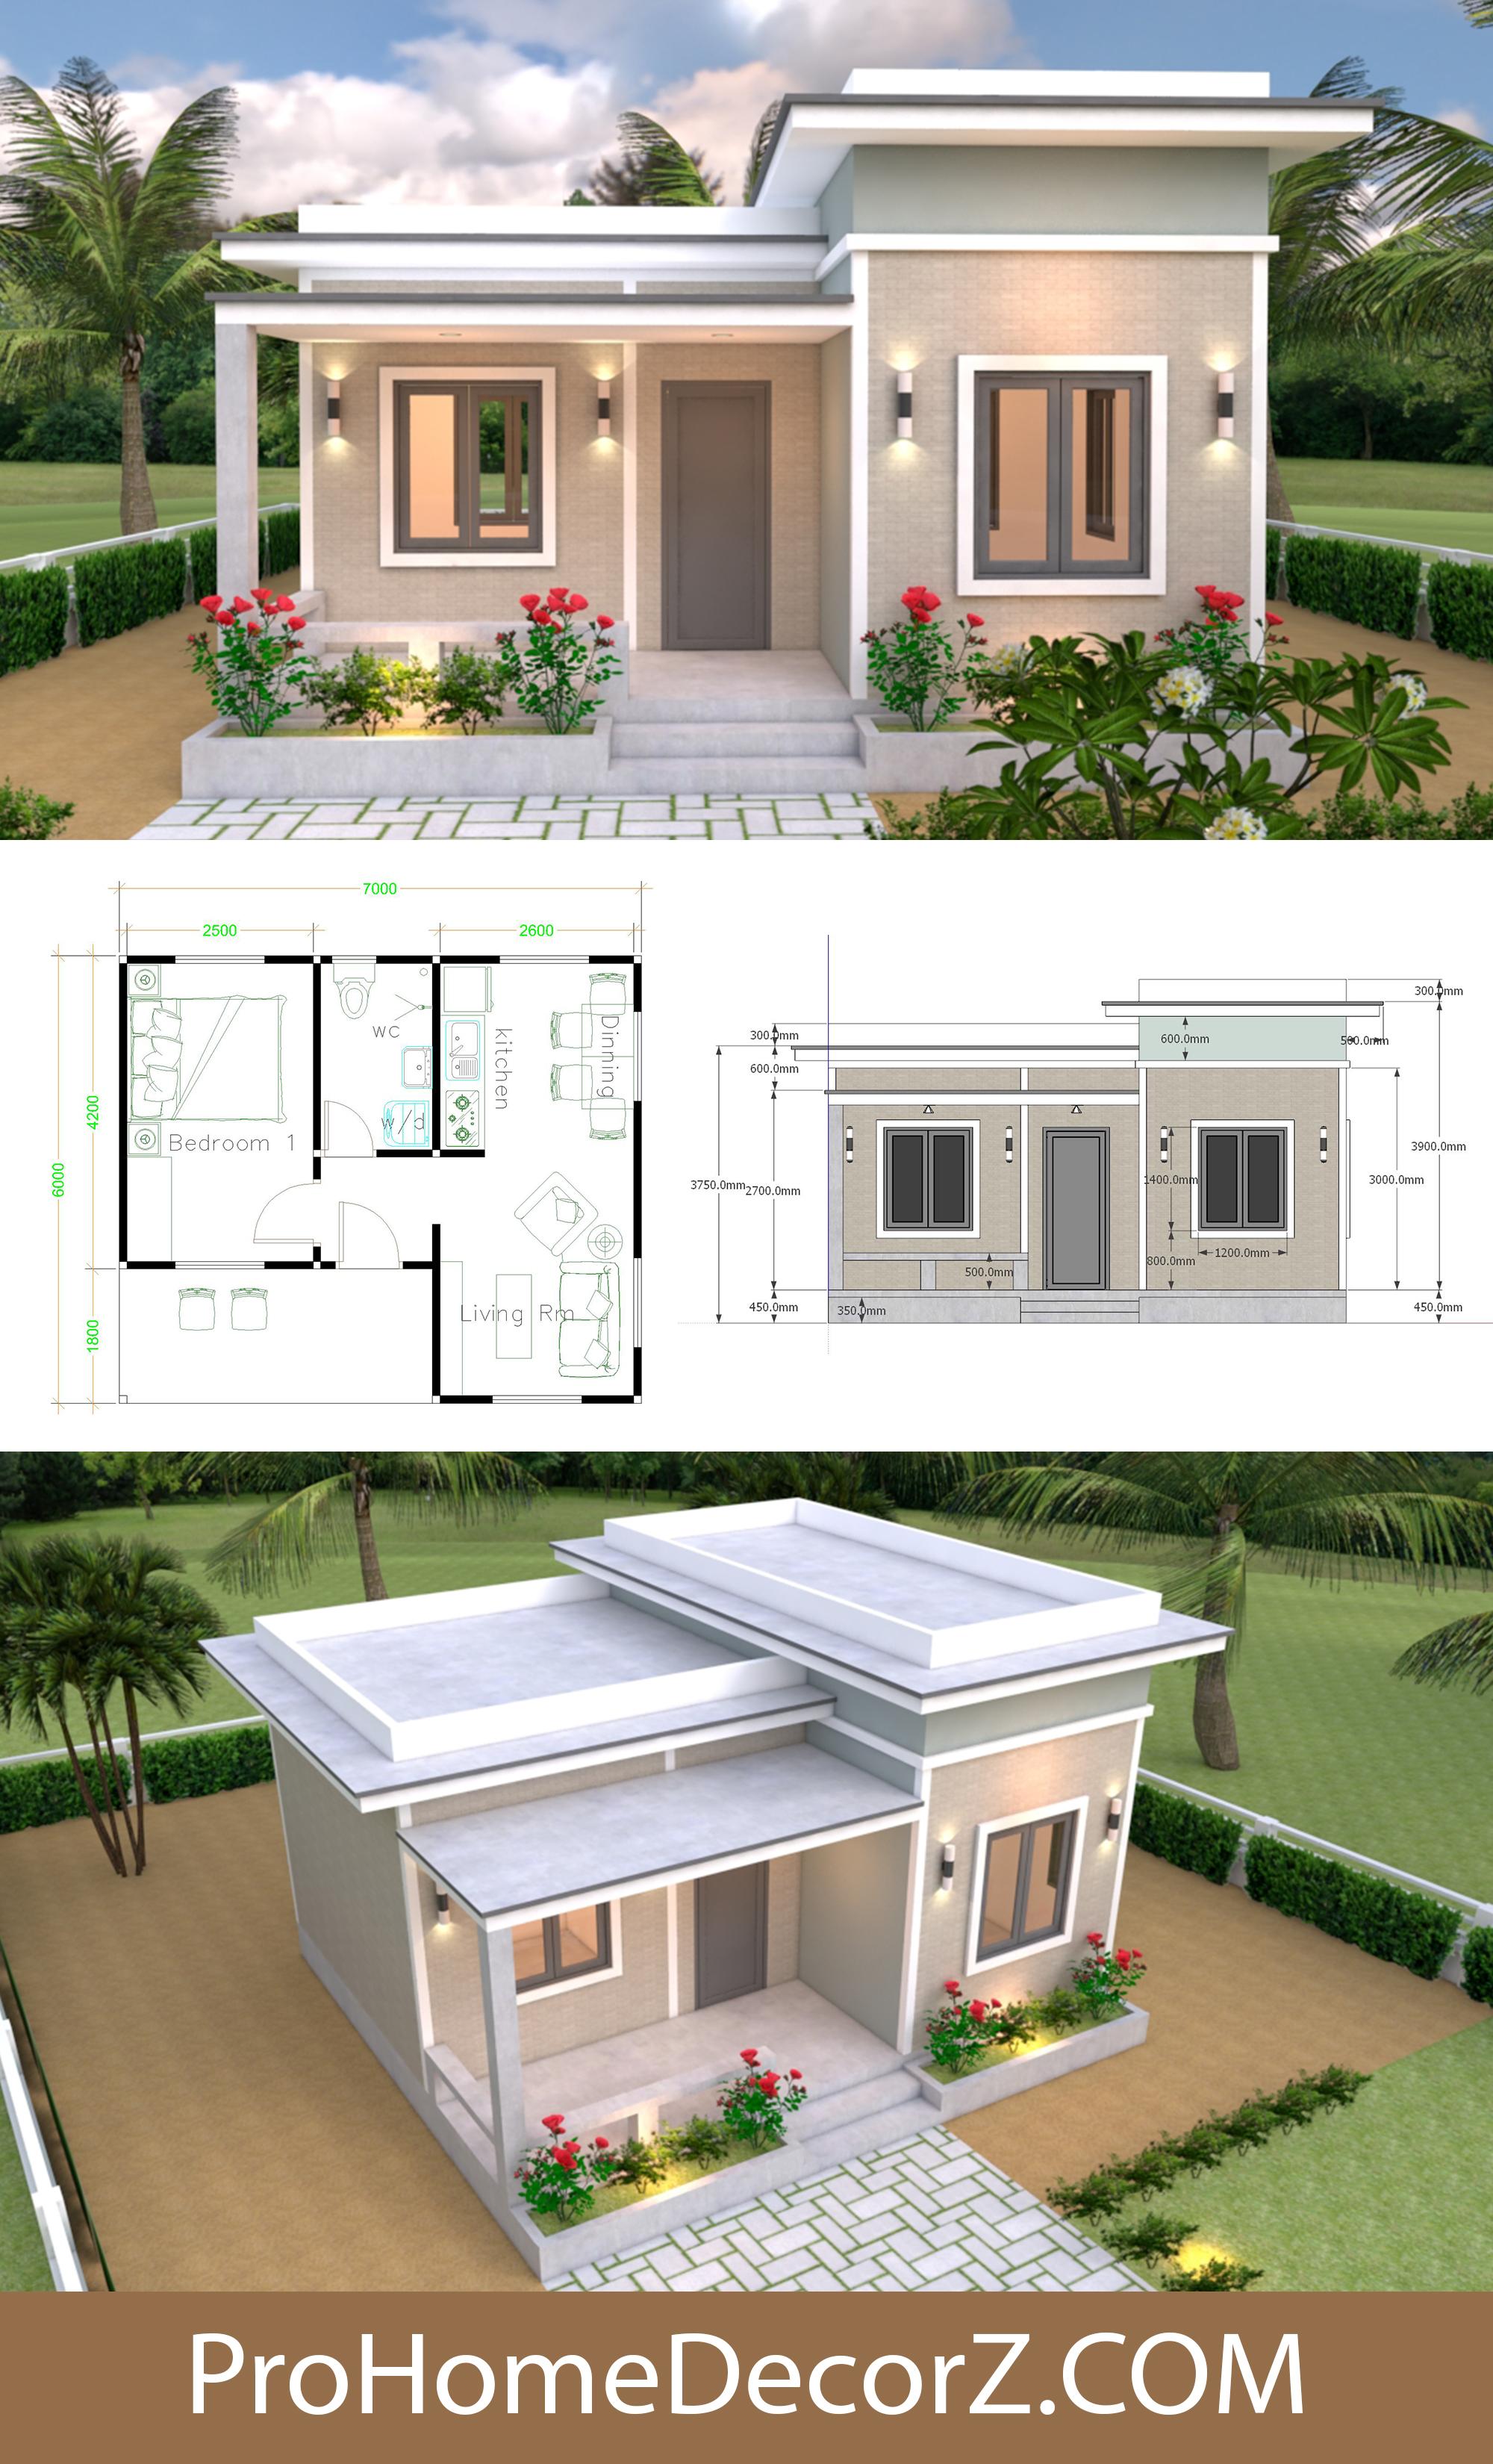 Flat roof Single Plans 7x6 Meters with Floor Plan